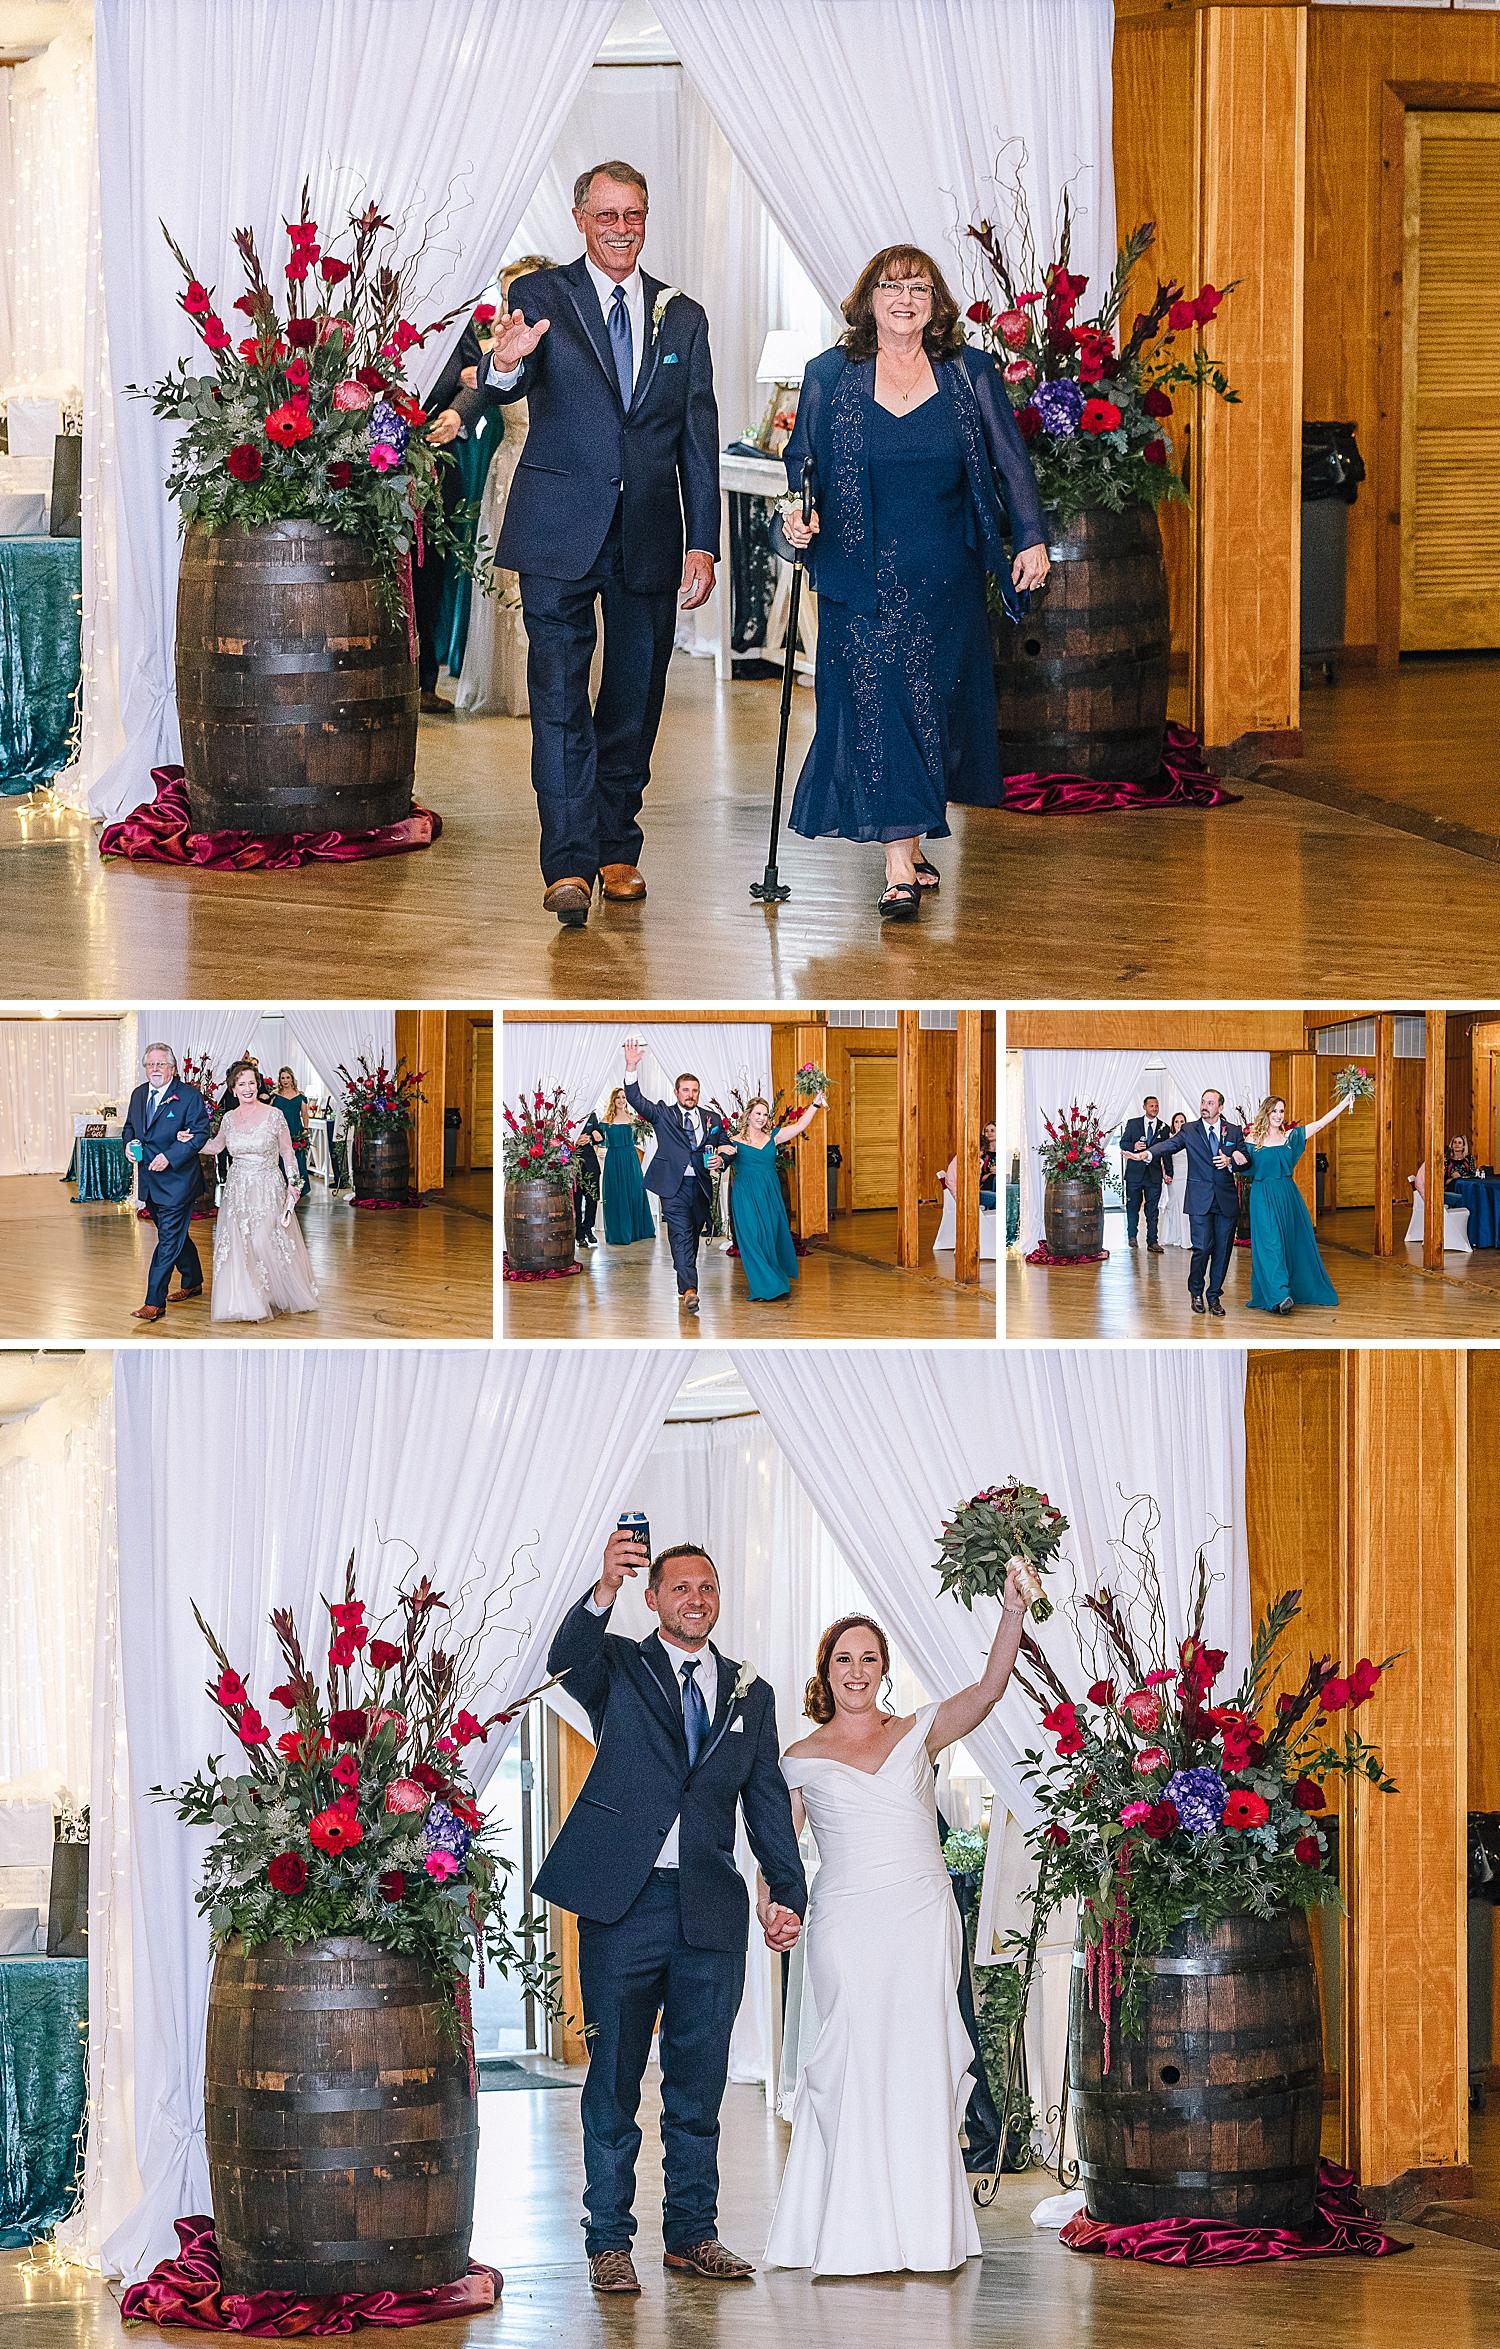 Jewel-Tone-Texas-Wedding-Valerie-Jason-Carly-Barton-Photography_0065.jpg